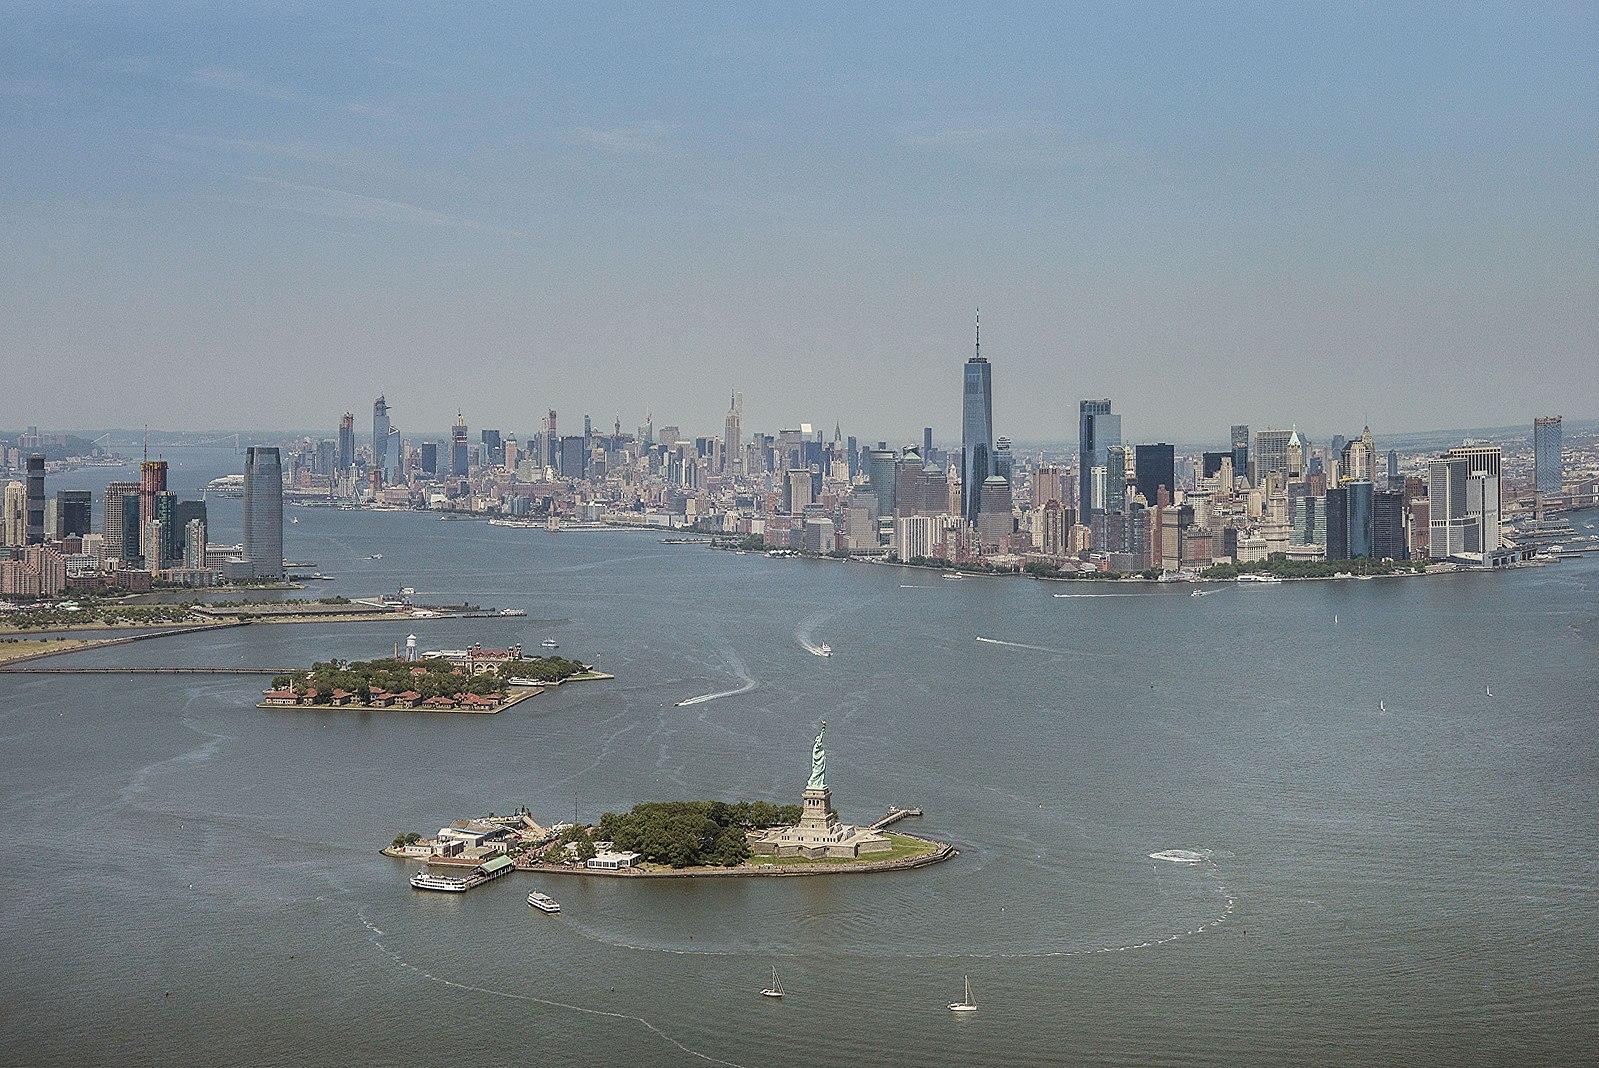 Aerial_photograph_of_New_York_Harbor-Statue_of_Liberty-Ellis_Island-Manhattan